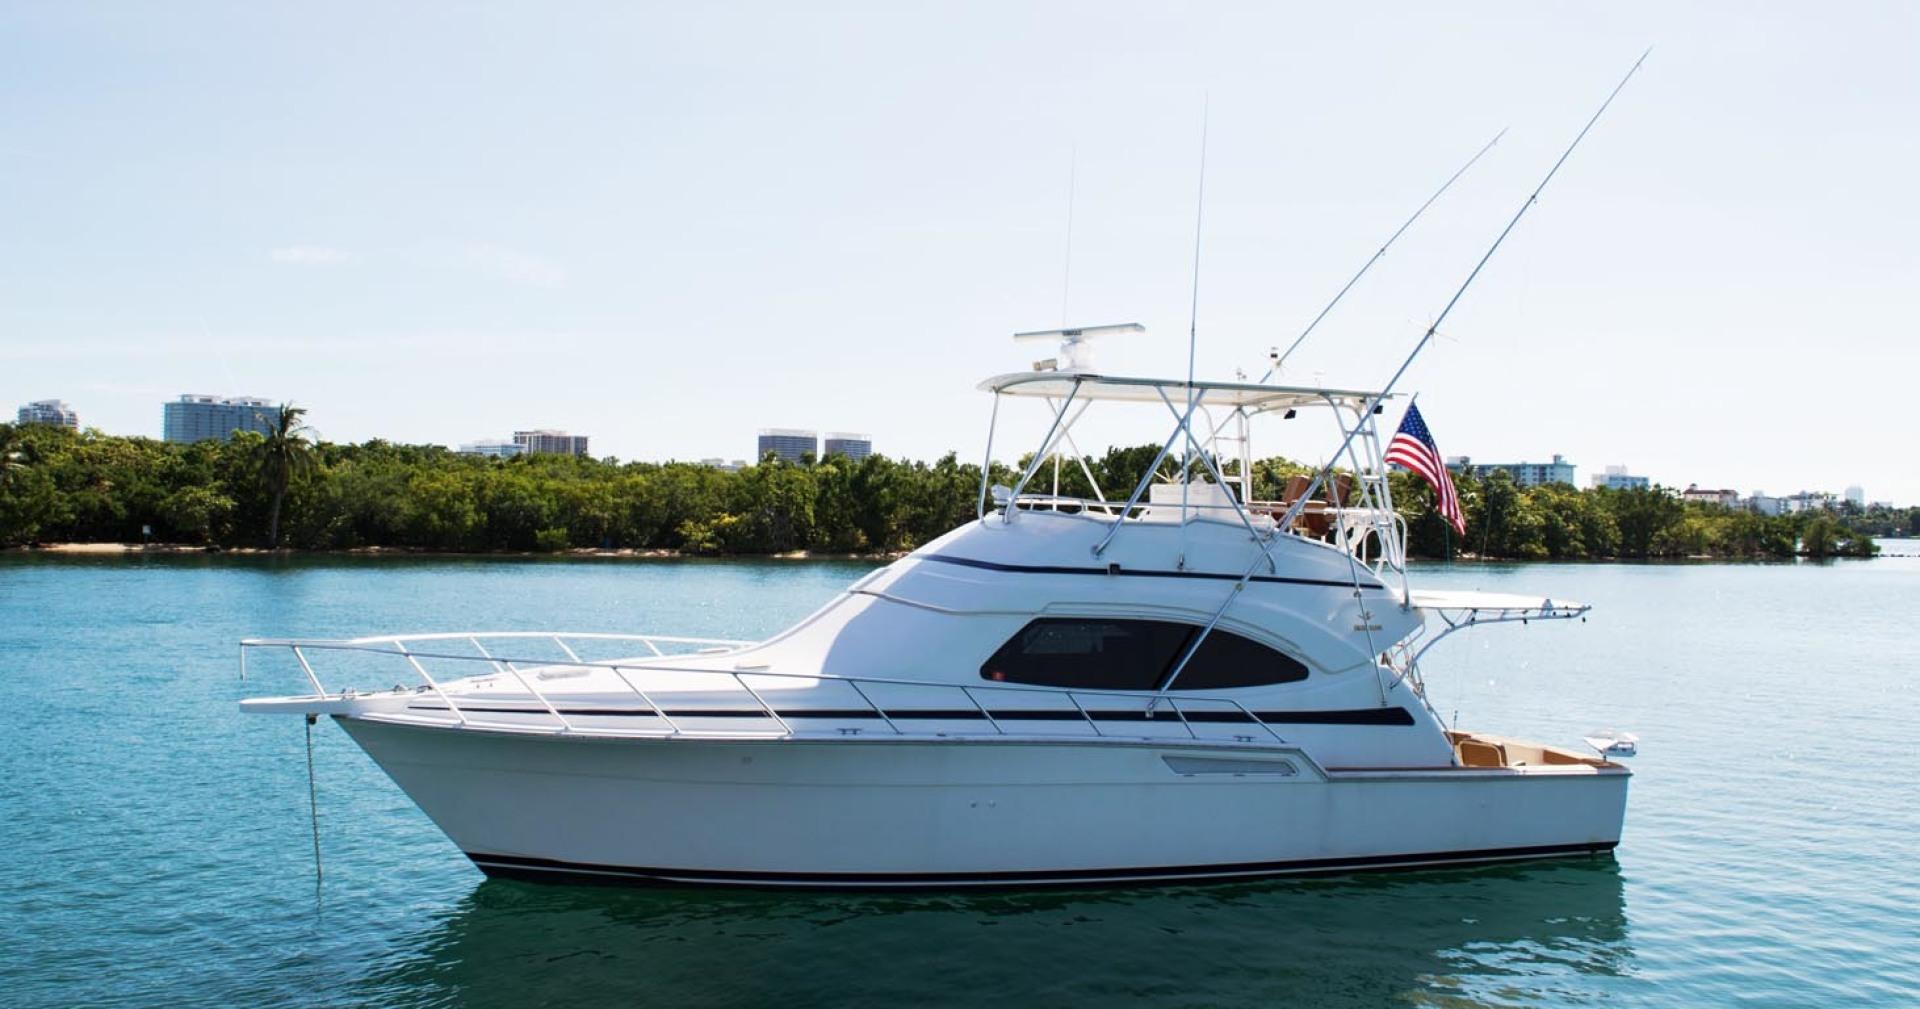 Bertram-450 Convertible 2002-SEA YA Sunny Isles Beach-Florida-United States-Port View-1289304 | Thumbnail